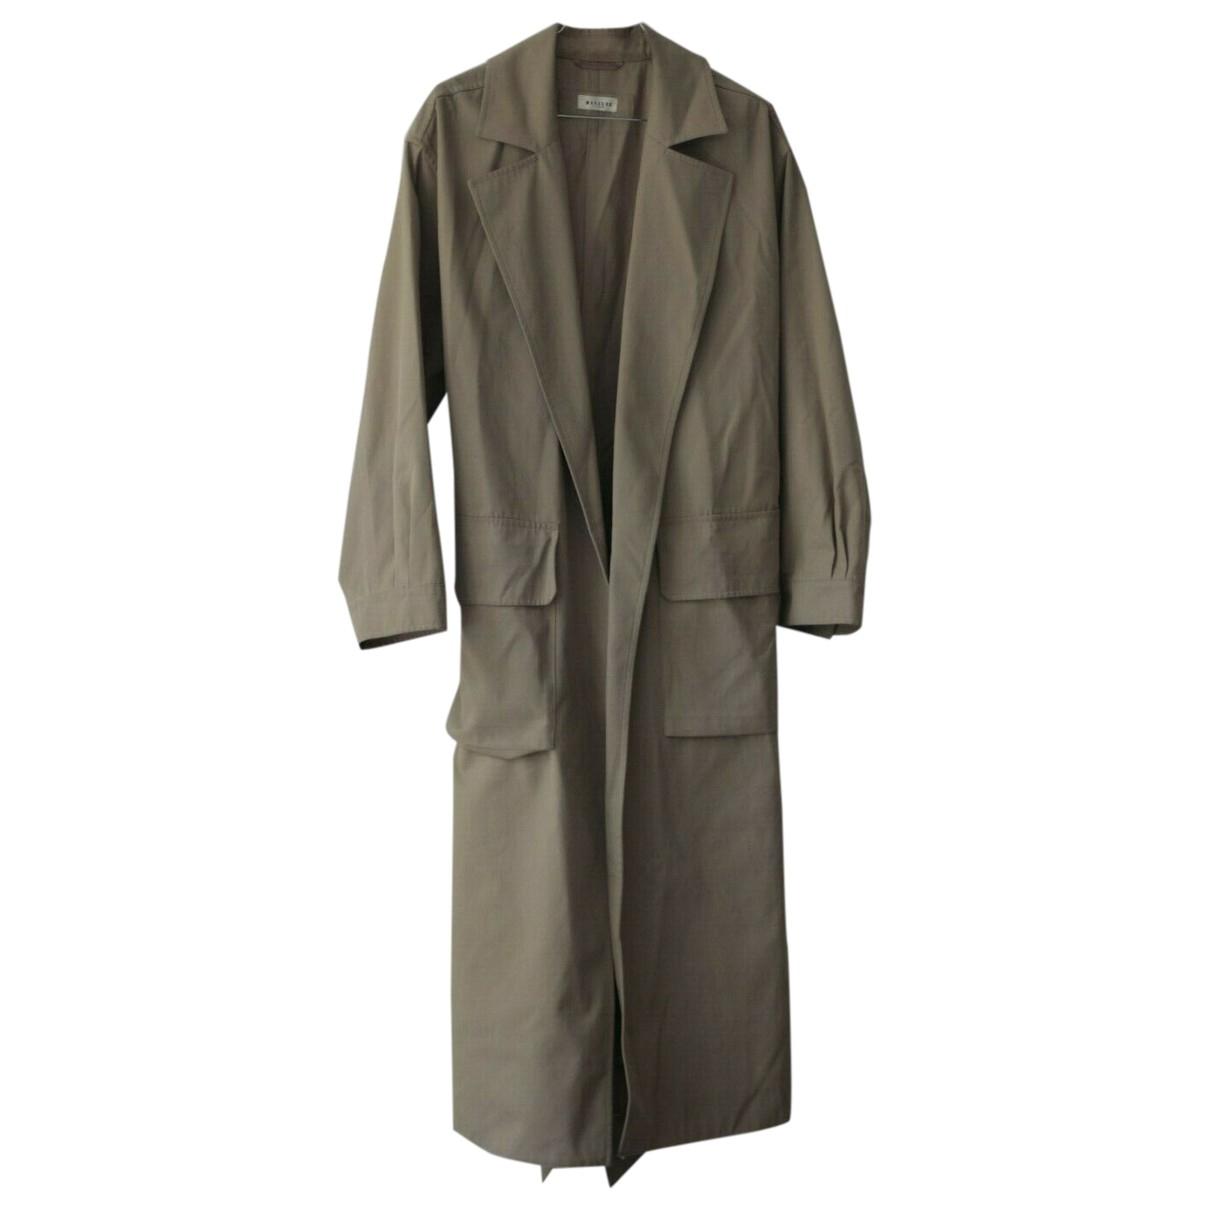 Masscob \N Beige Cotton coat for Women 38 FR